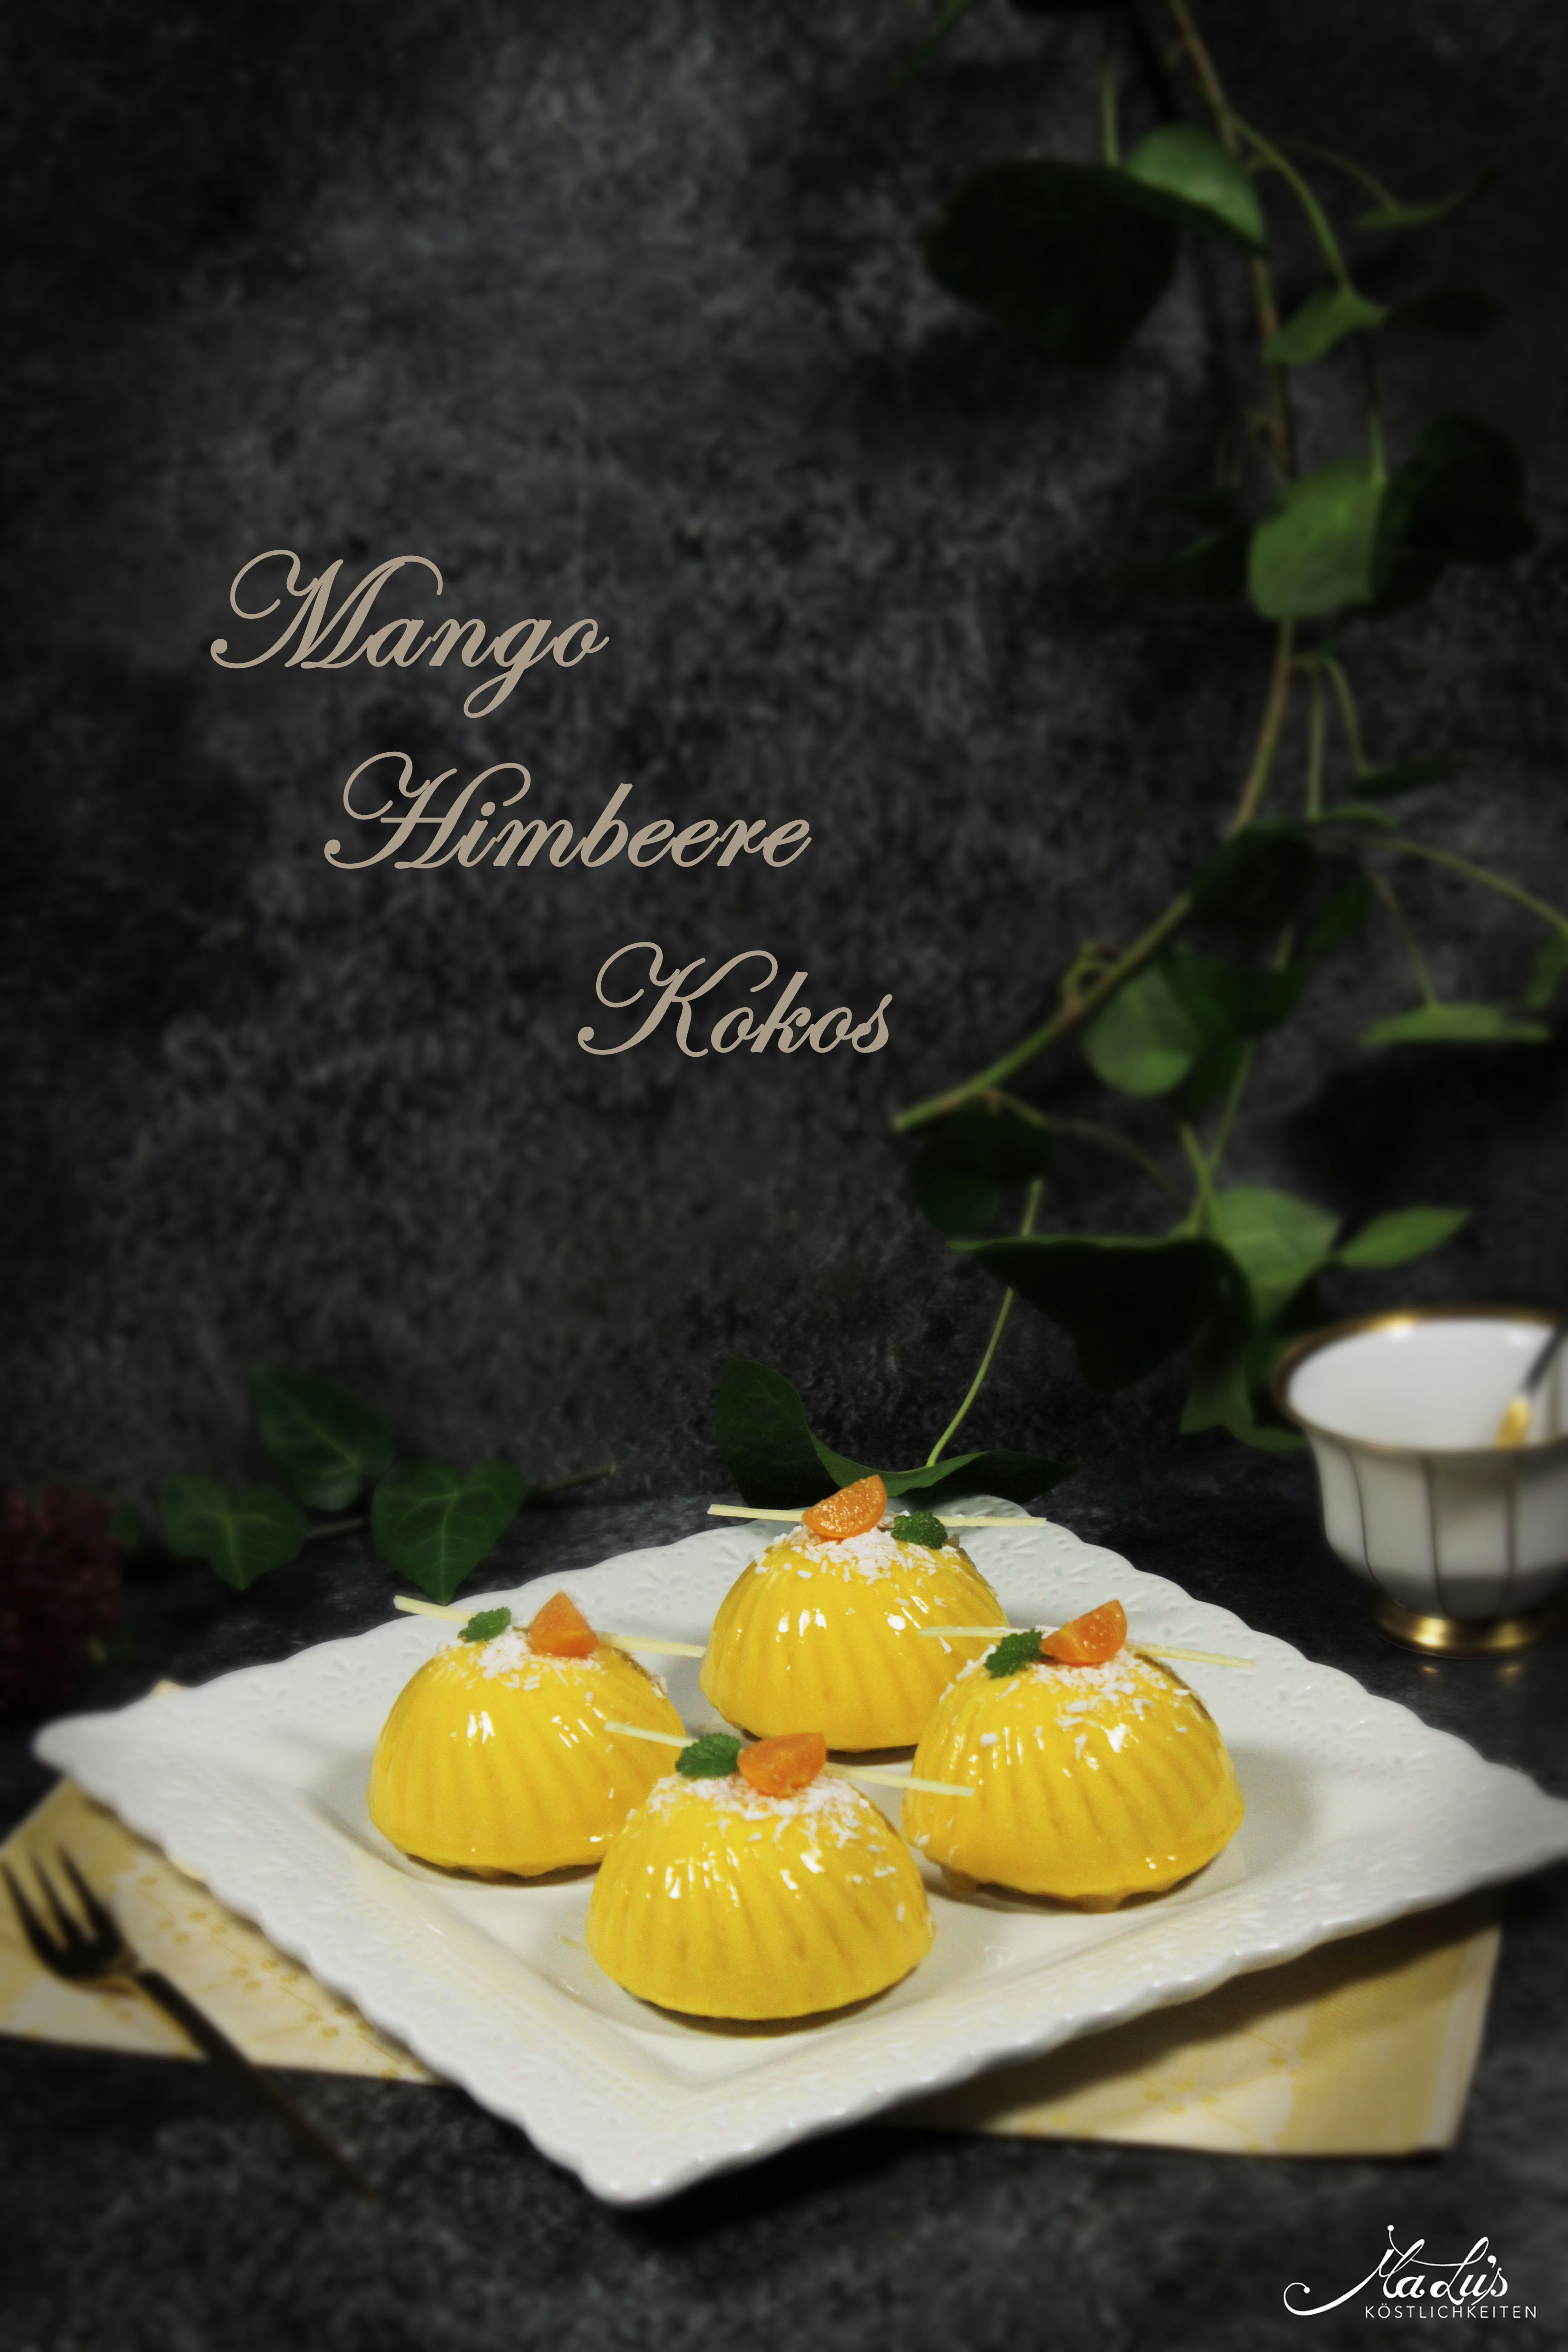 mango-himbeer-kokosto%cc%88rtchen-1a